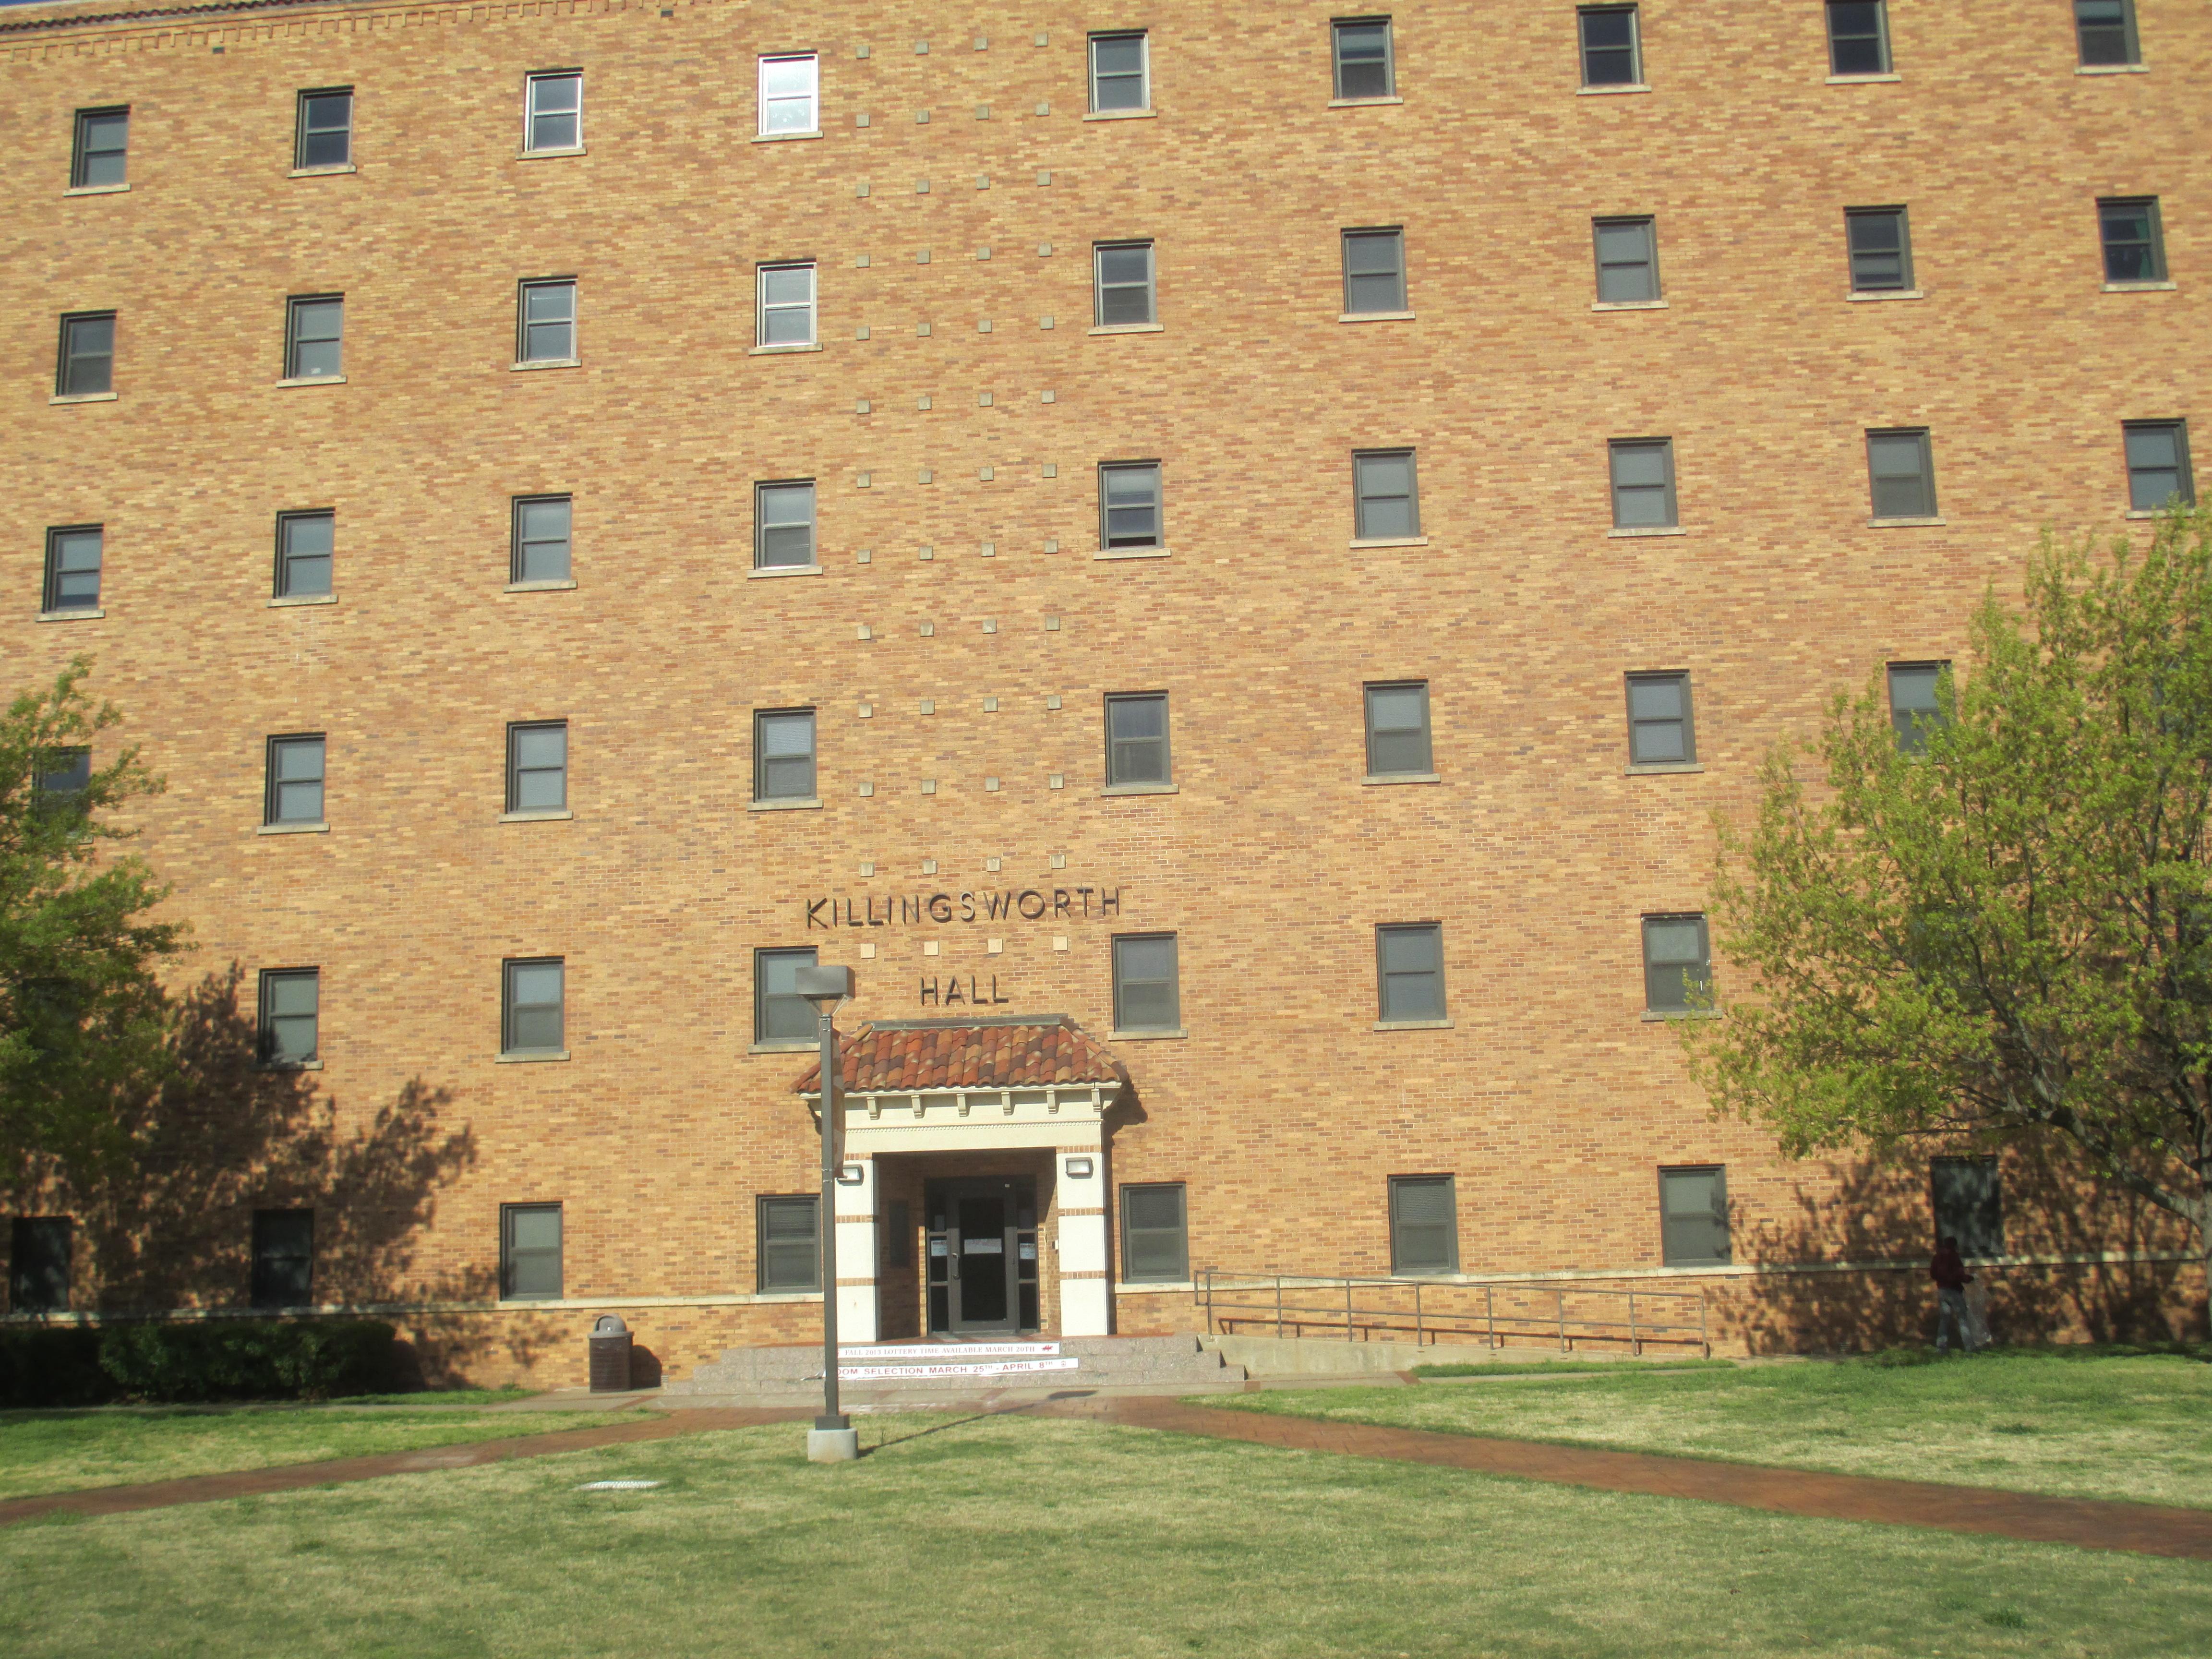 File Killingsworth Hall Midwestern State Univ Wichita Falls Tx Img 6943 Jpg